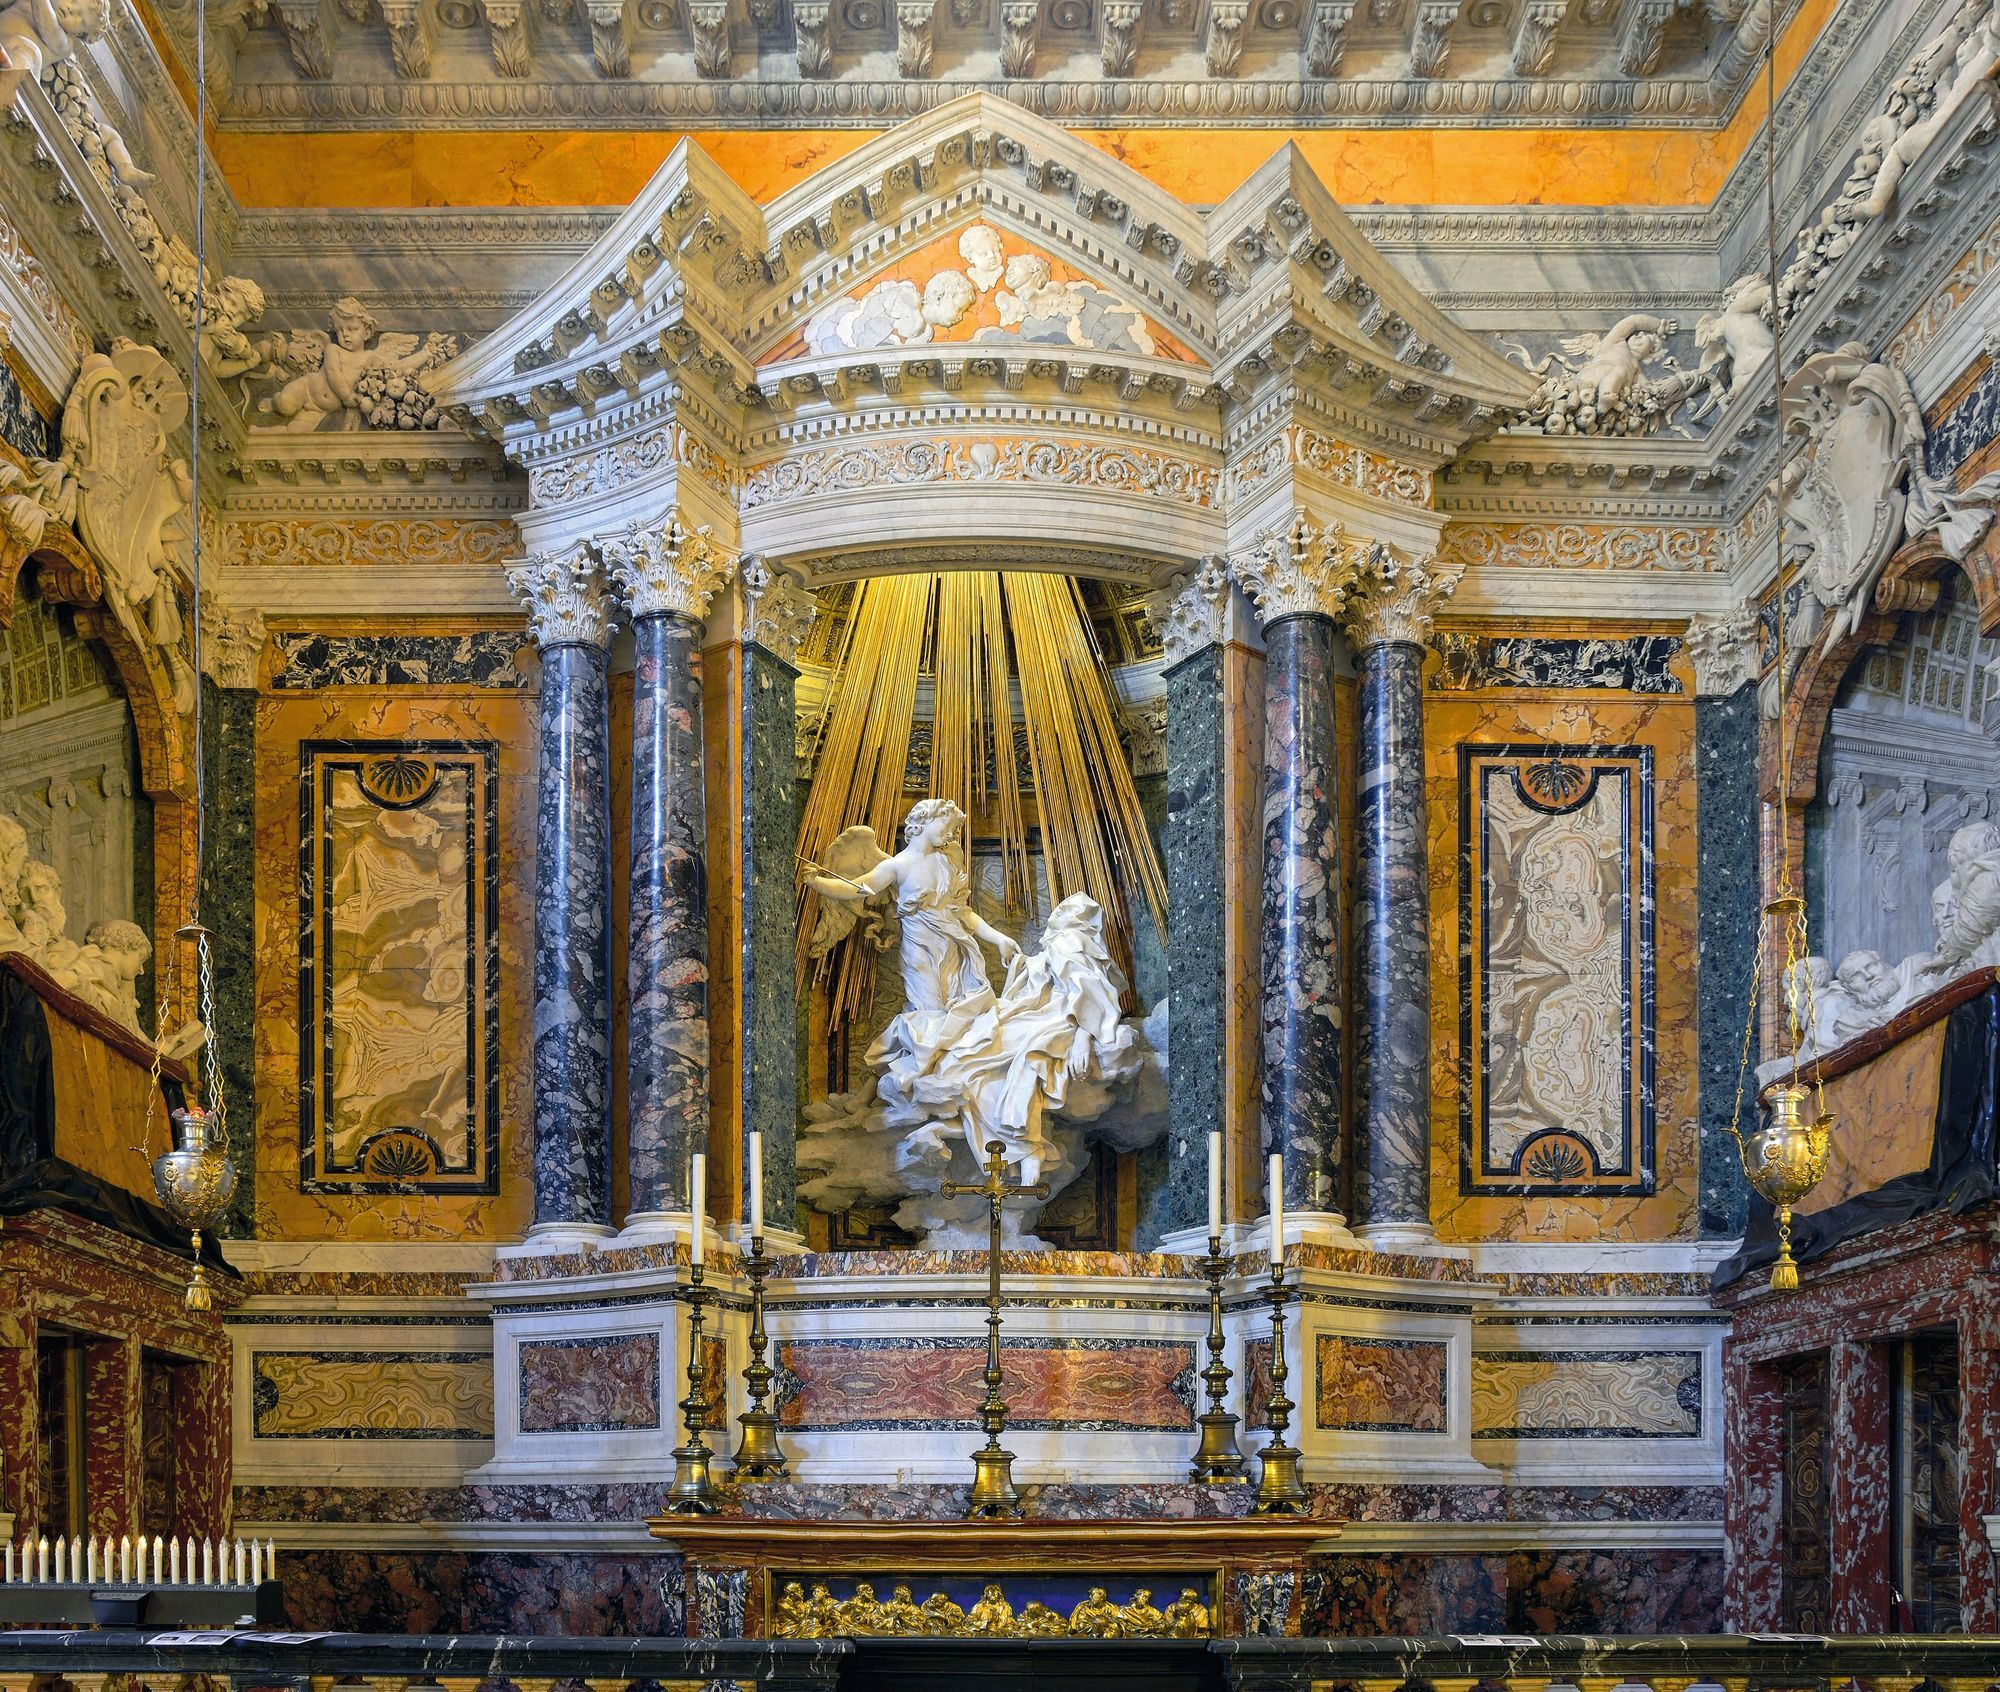 Le Bernin, sculpture en marbre, 1652, chapelle Cornaro de l'église baroque Santa Maria della Vittoria, Rome